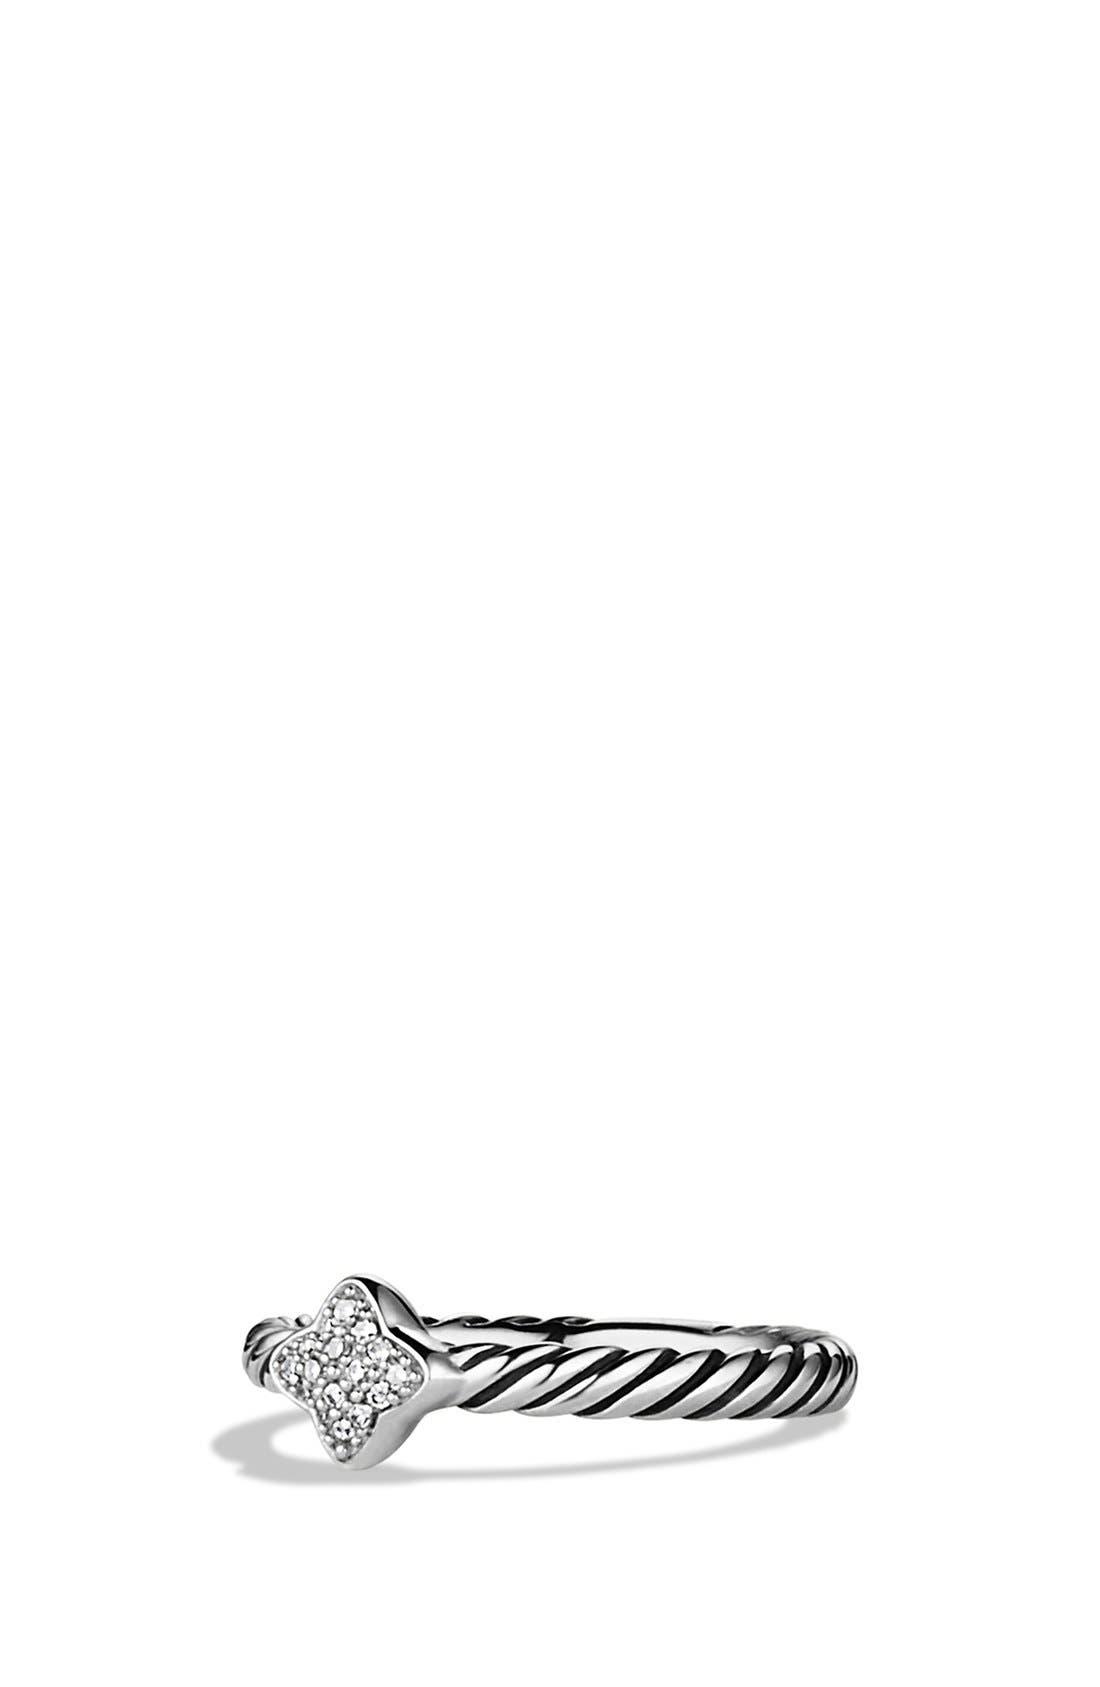 Main Image - David Yurman 'Cable Collectibles - Quatrefoil' Ring with Diamonds